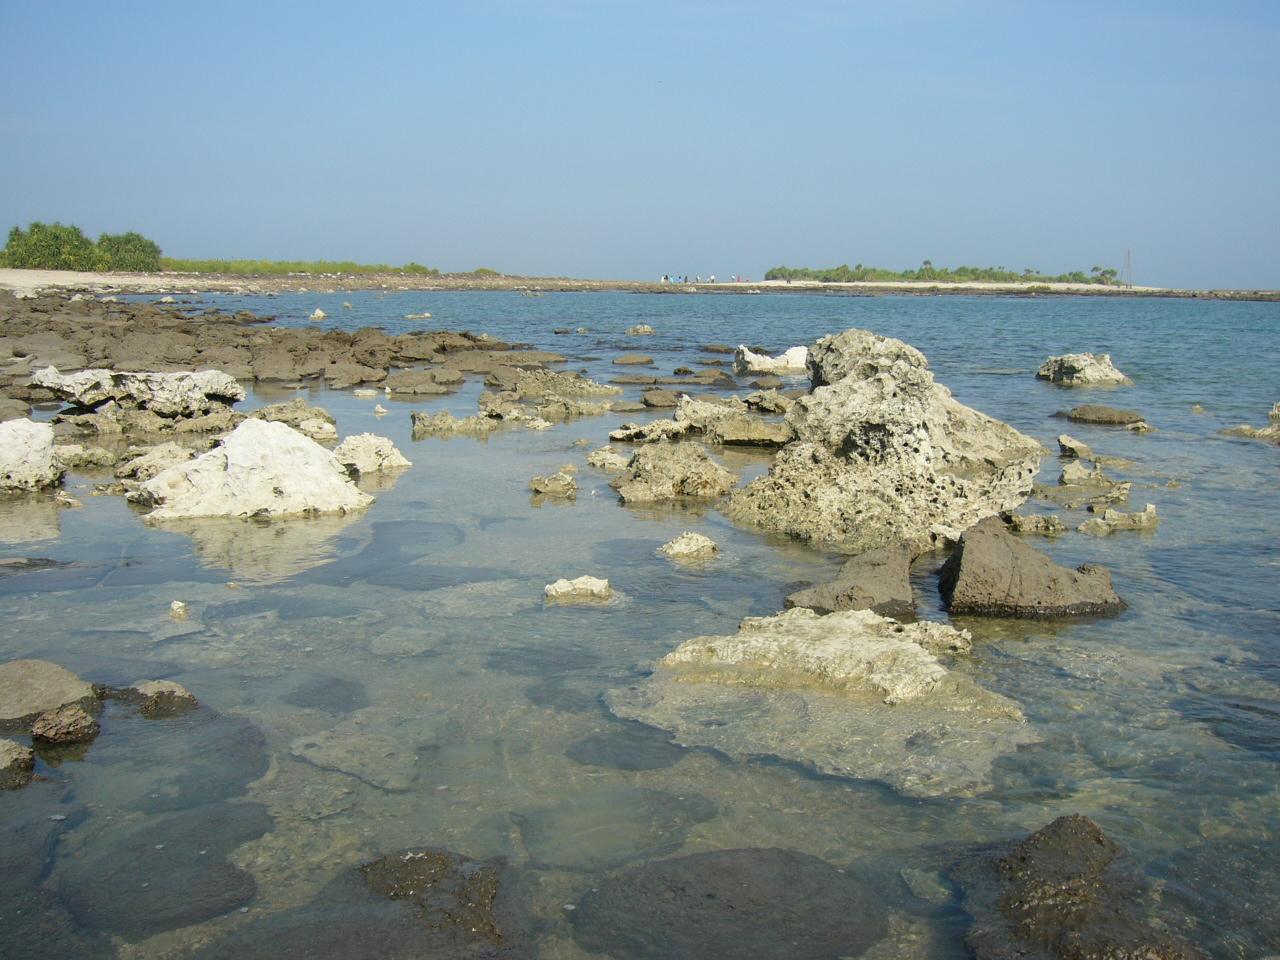 St_Martin_Island_Corals